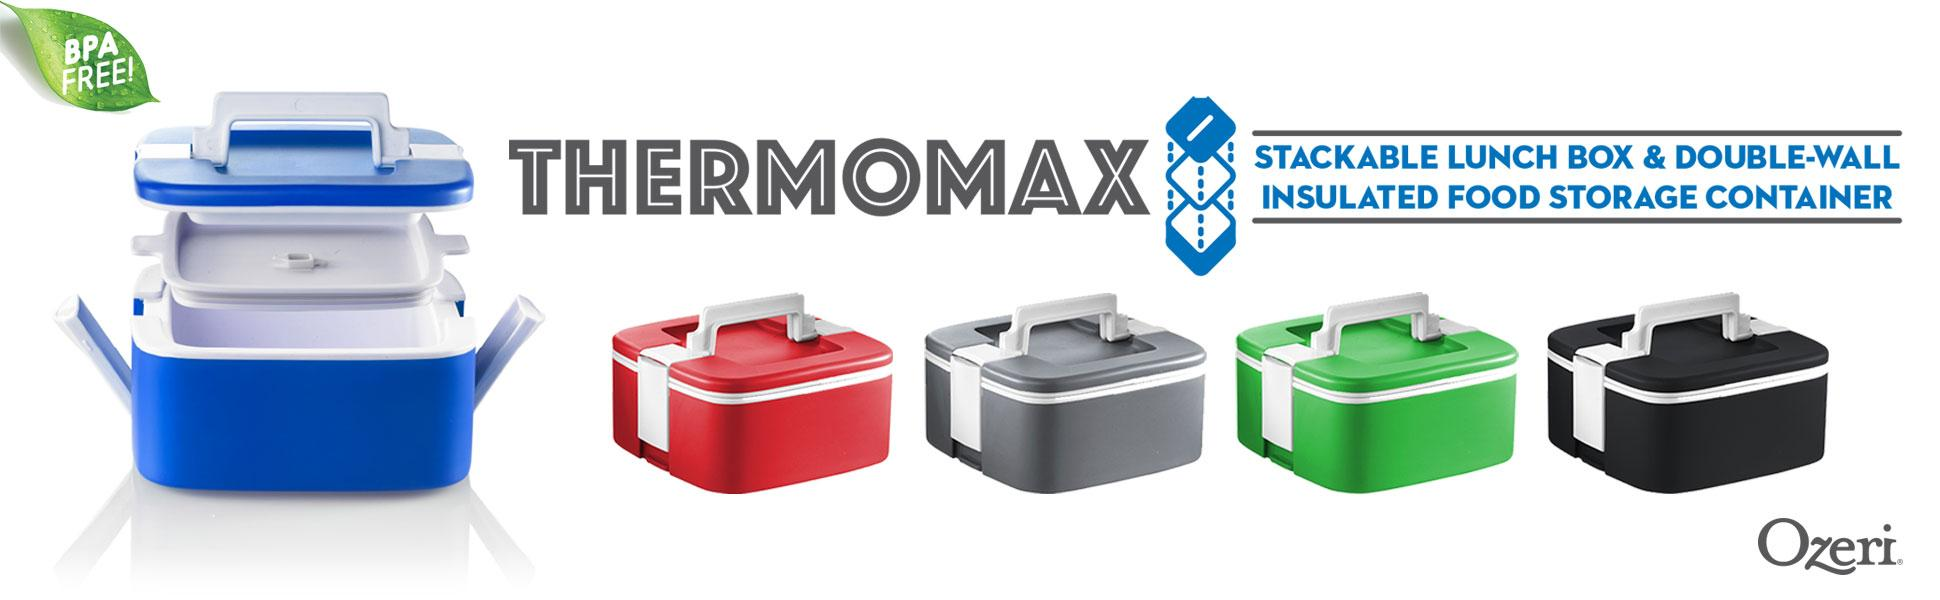 Amazon Com Ozeri Fs3 Bl Thermomax Stackable Lunch Box And